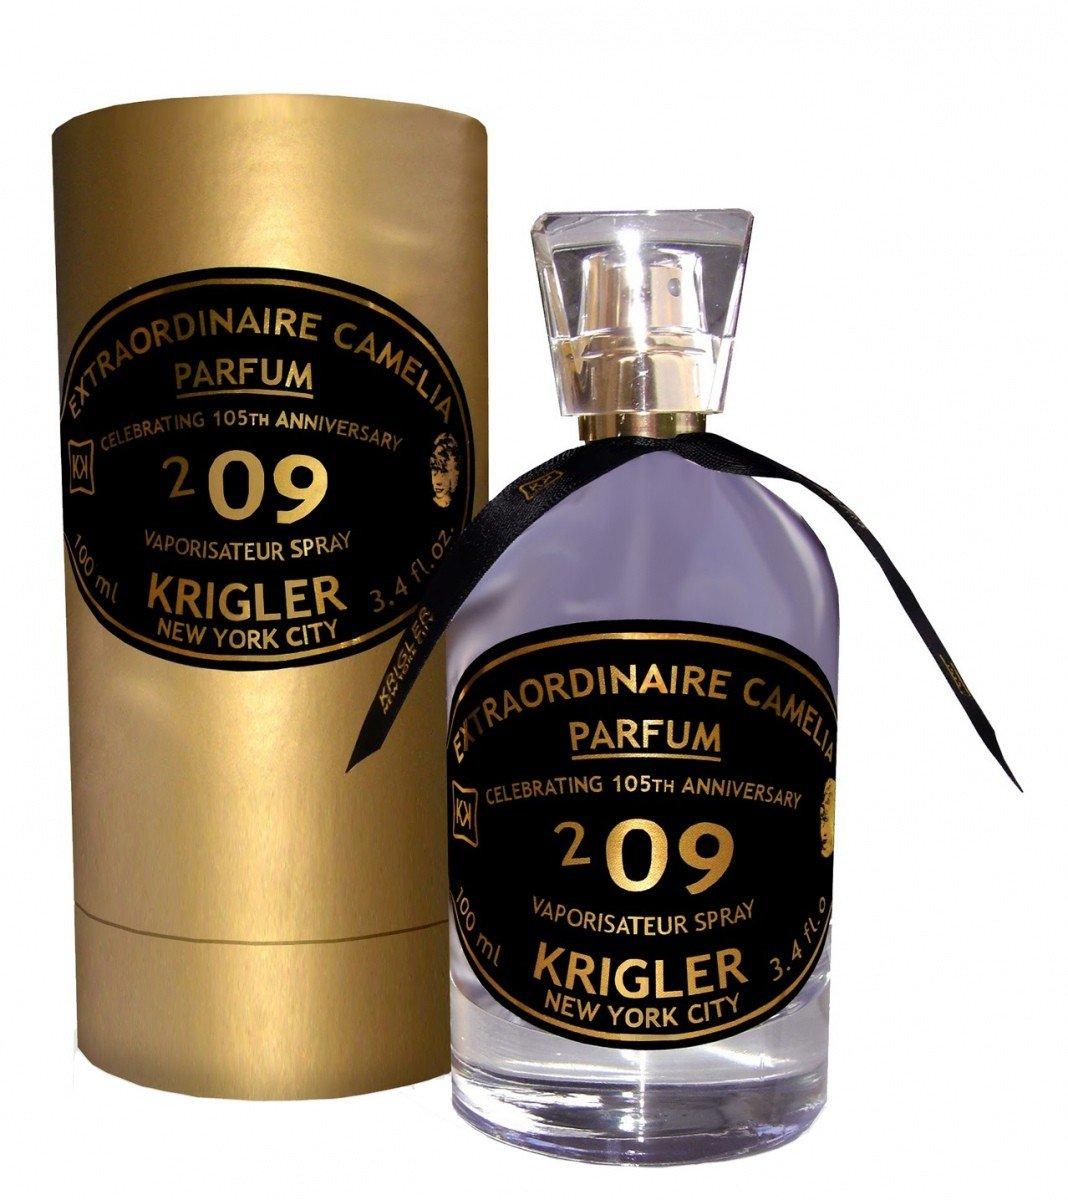 Ben Krigler makes fragrances generations of royals and ...